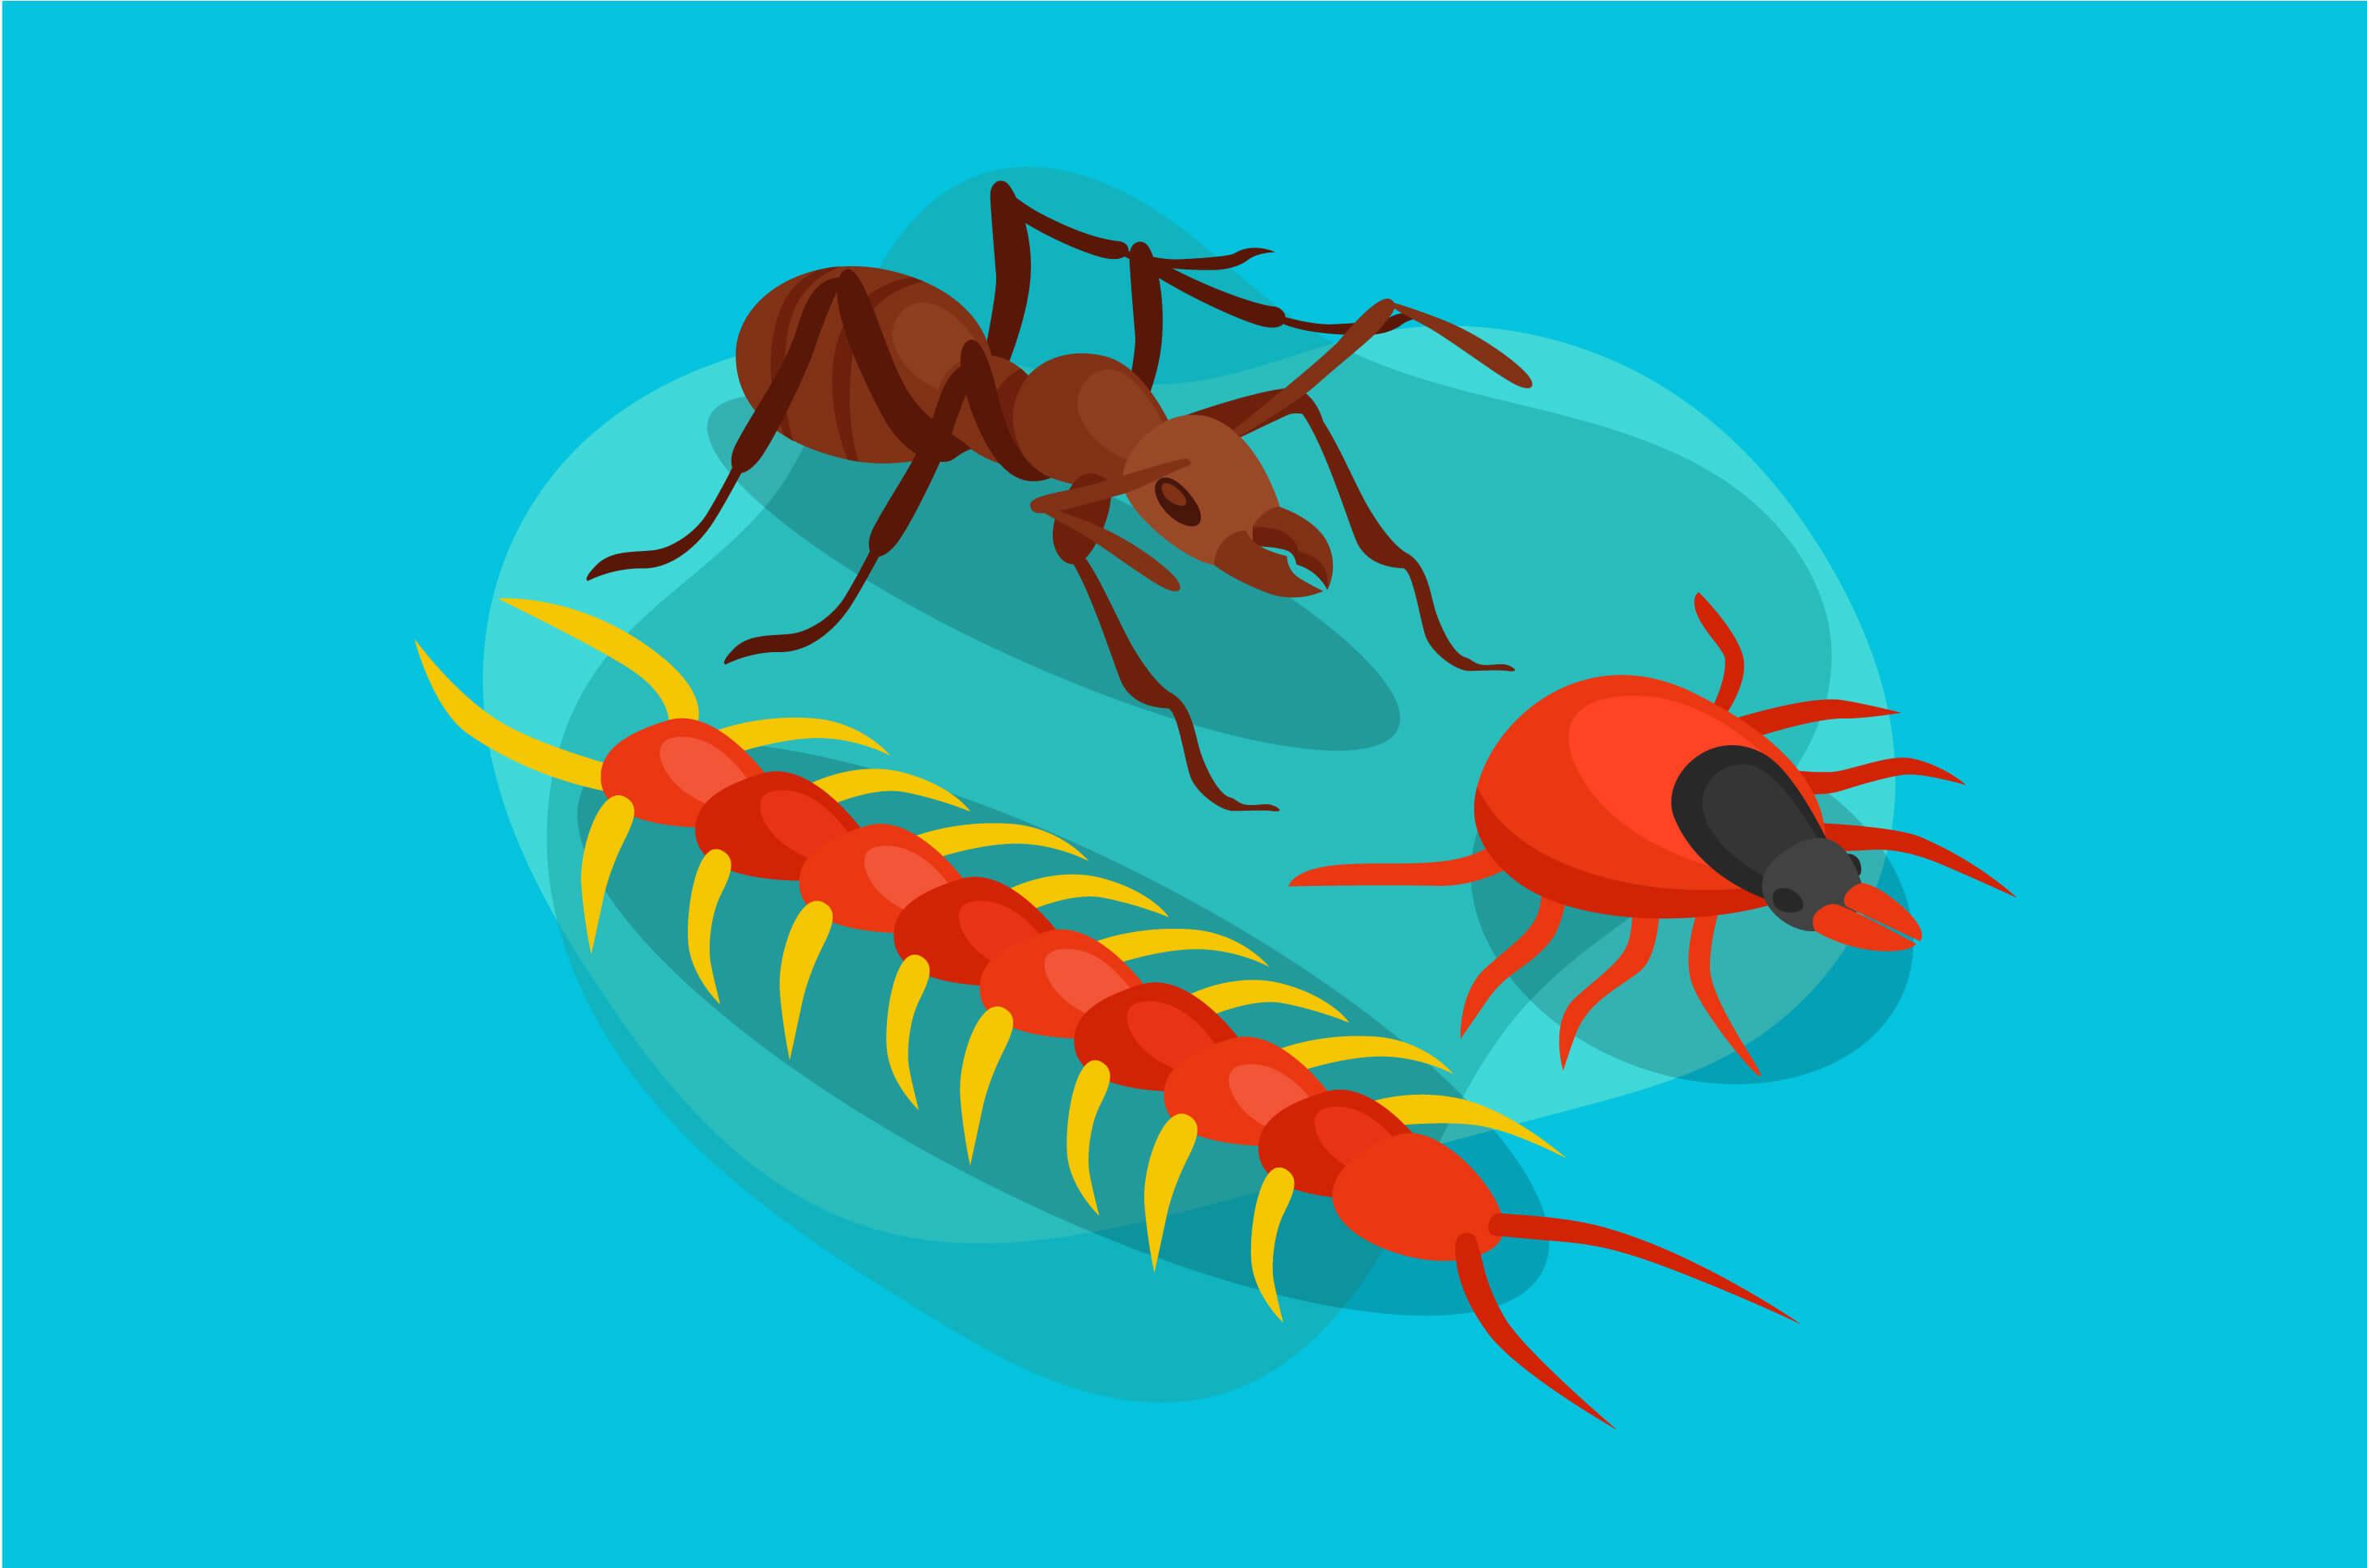 Inilah Reaksi Tubuh Ketika Terkena Gigitan Serangga